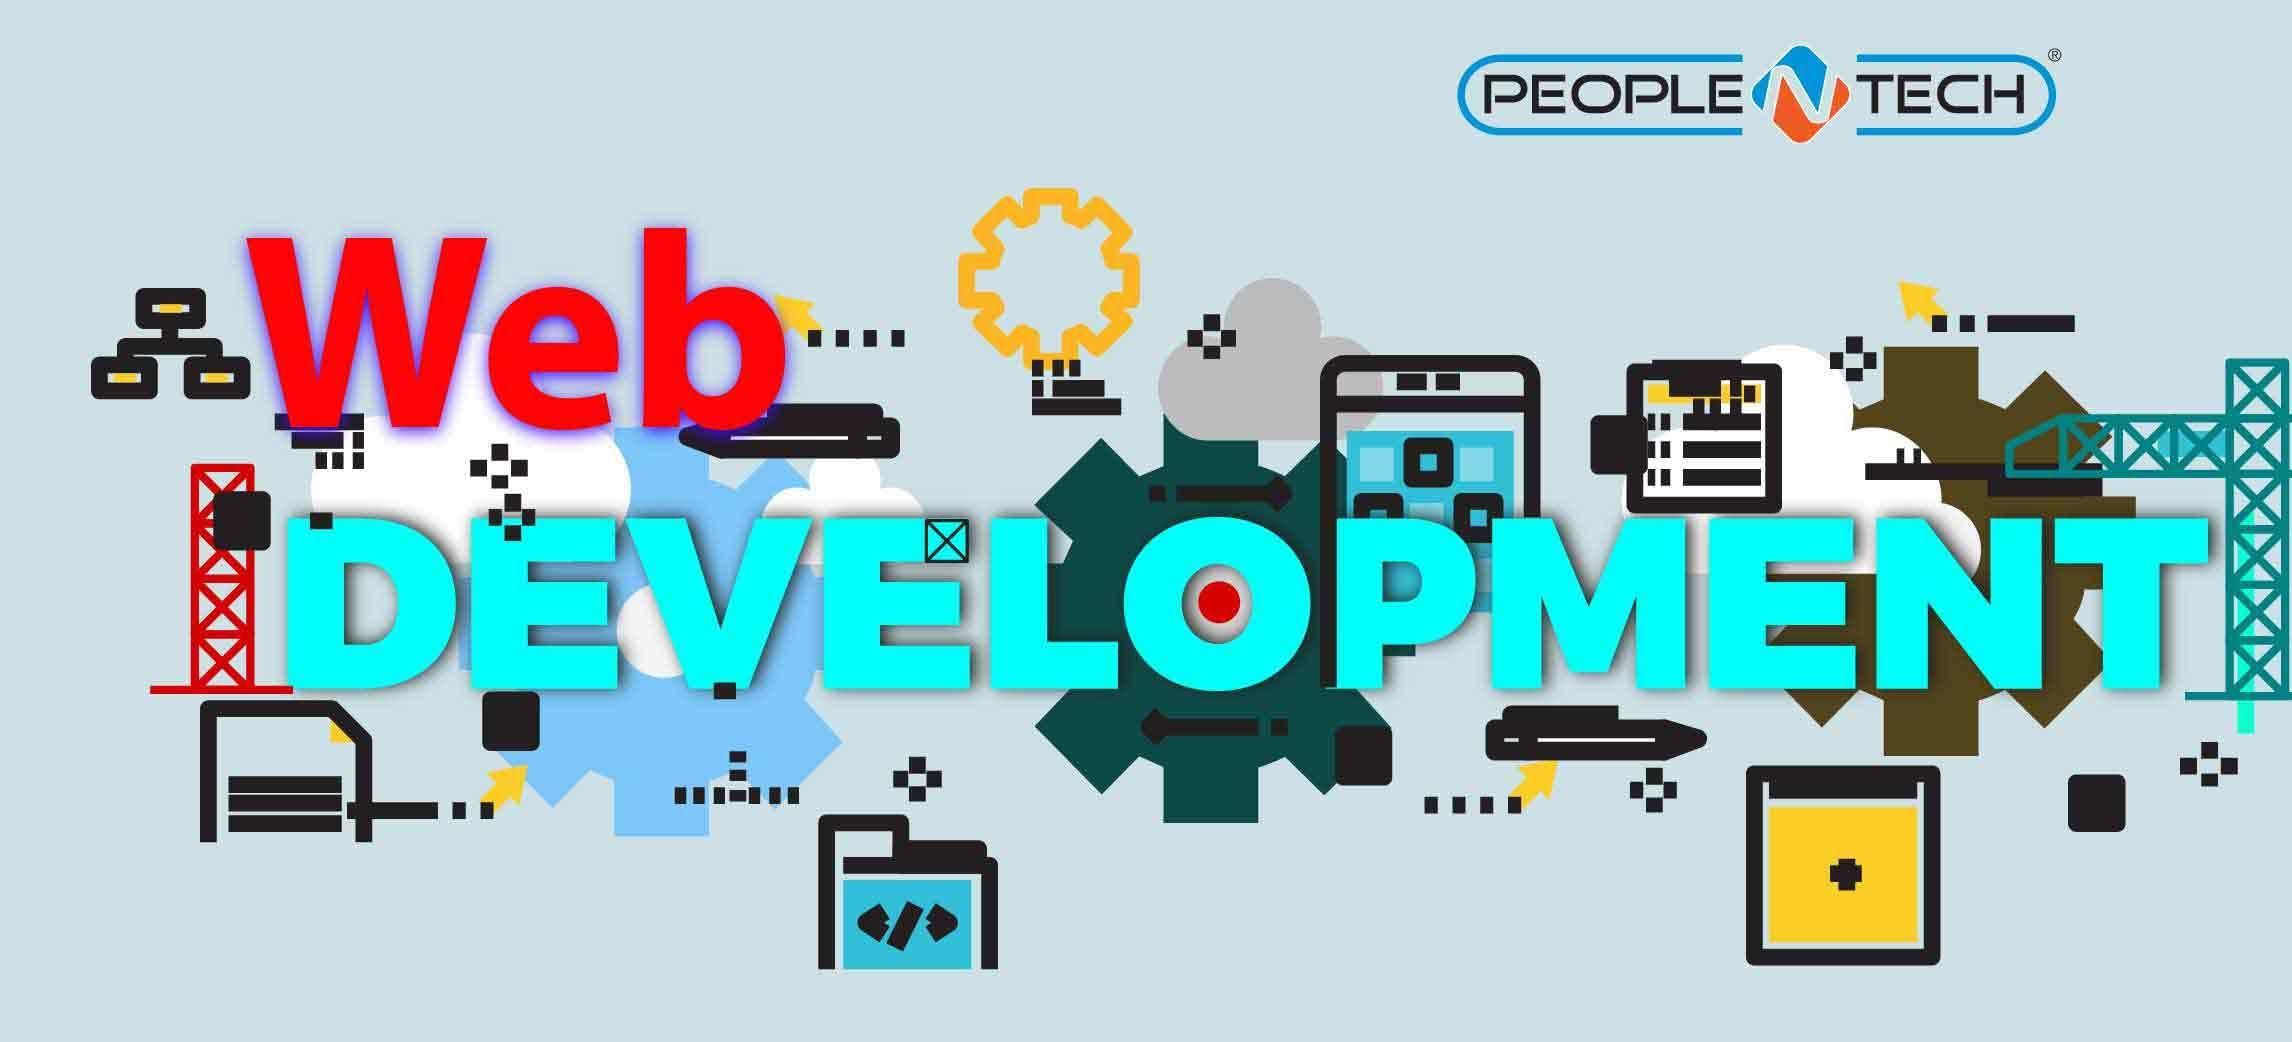 Simbainfotech is Web development company that provides web